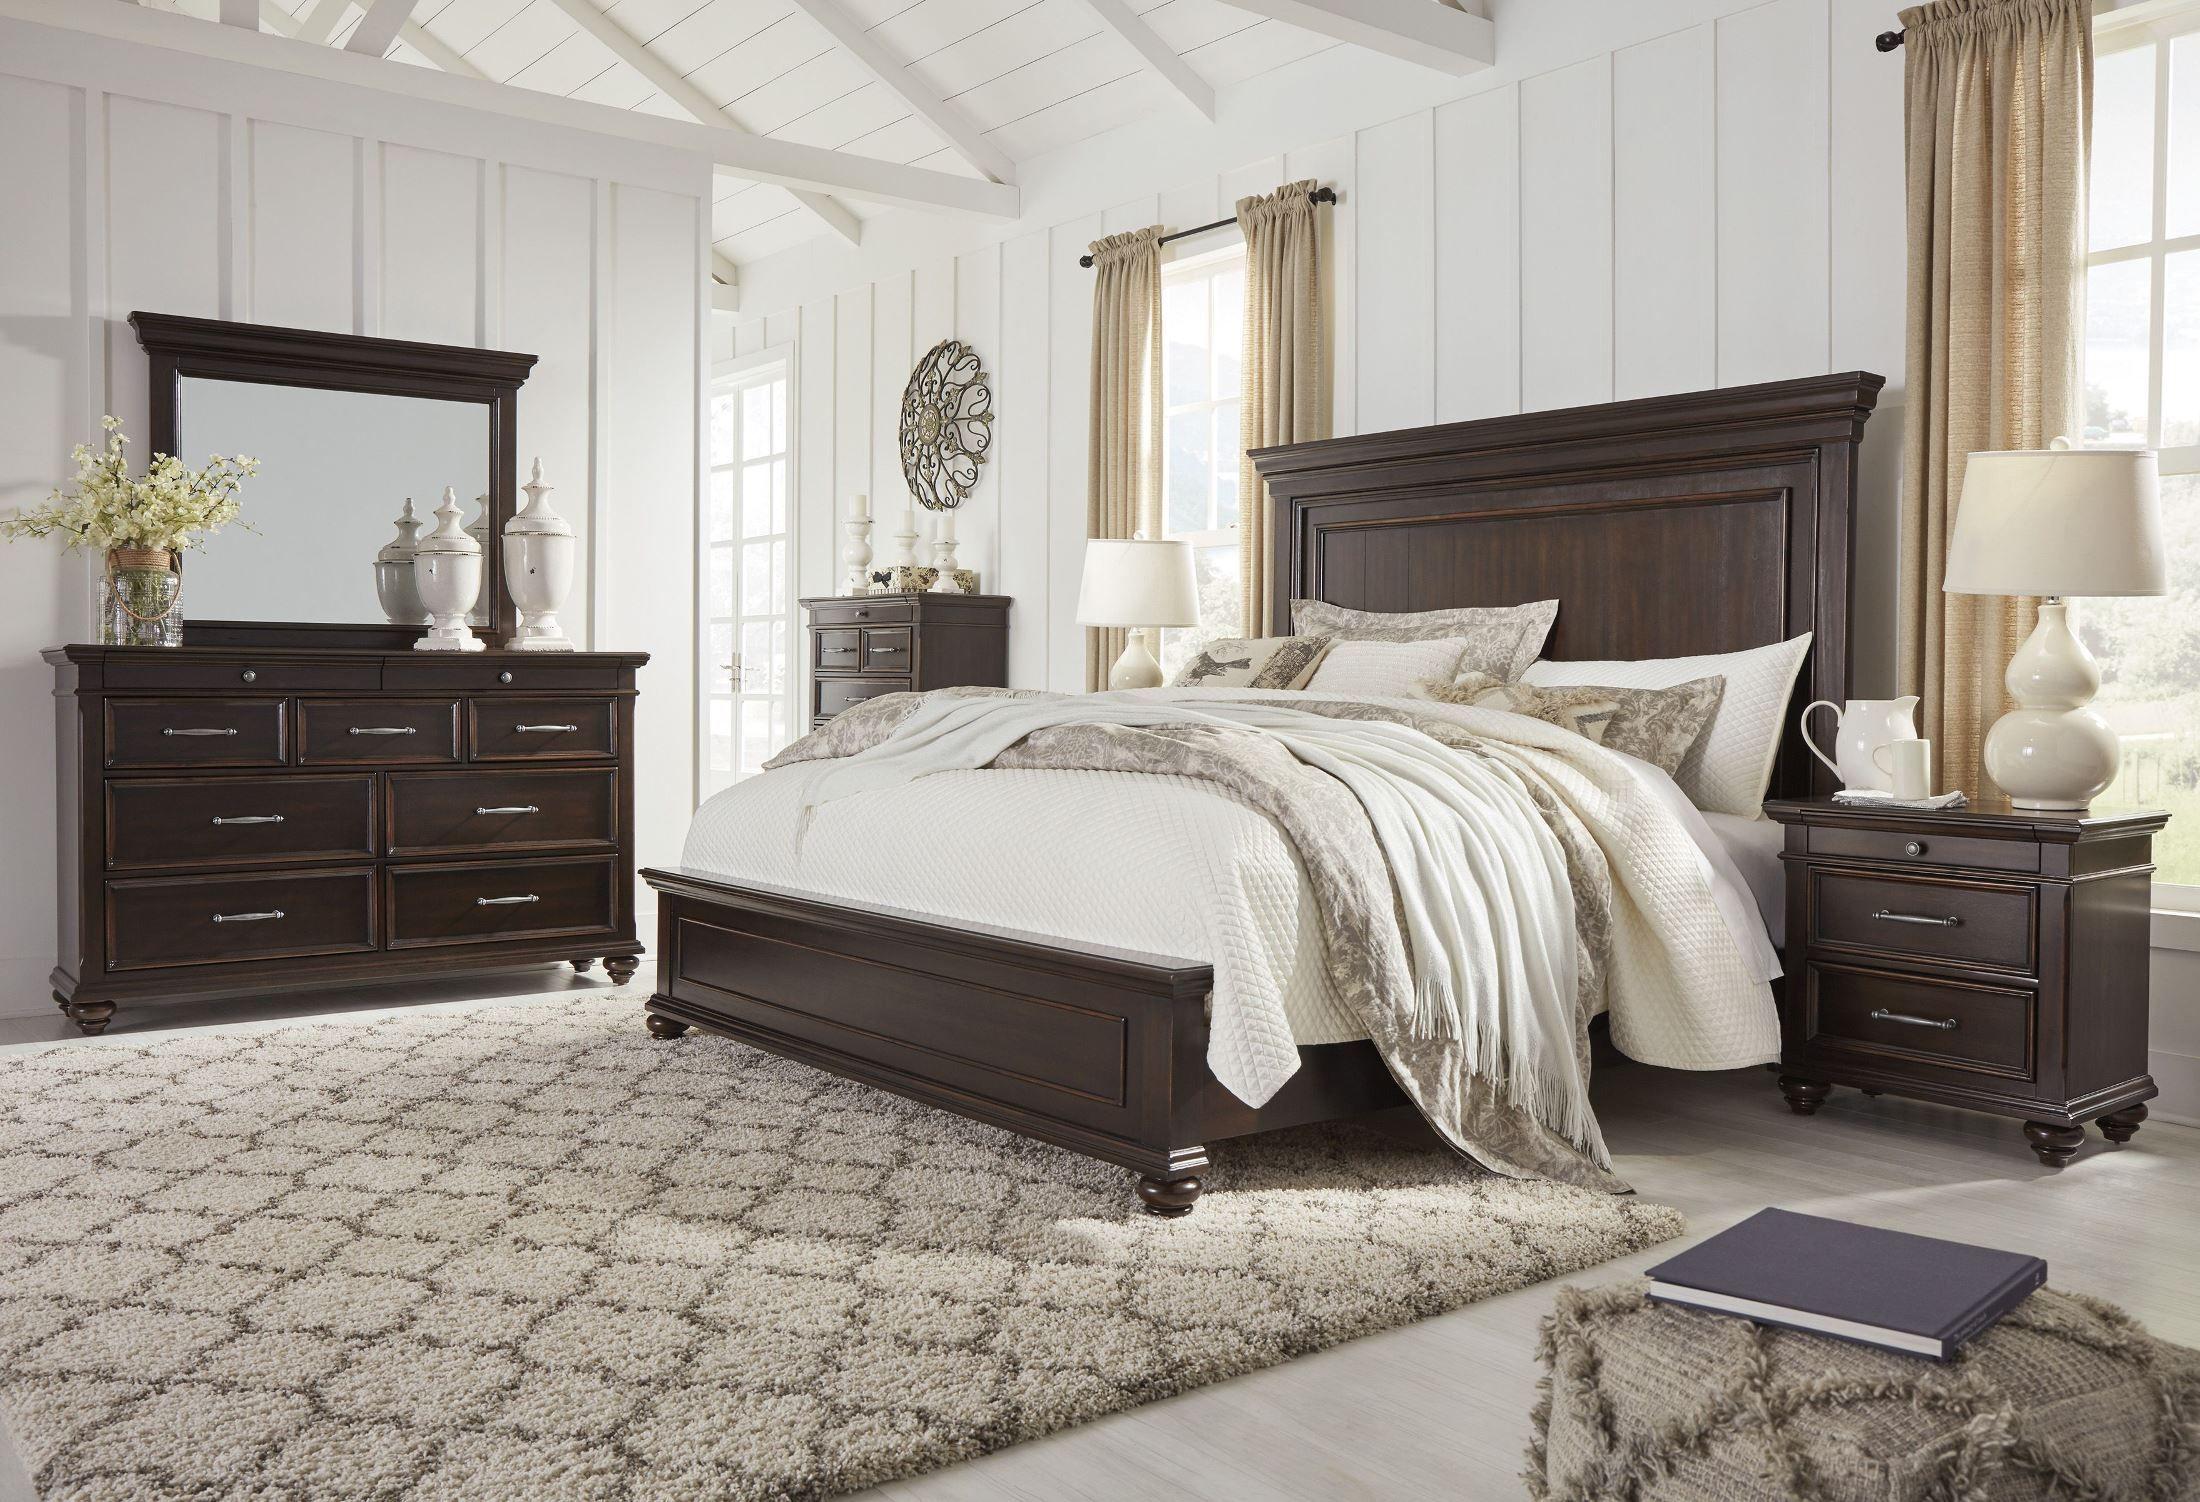 Brynhurst Dark Brown King Panel Bed In 2021 Brown Furniture Bedroom Dark Brown Bedrooms Dark Bedroom Furniture